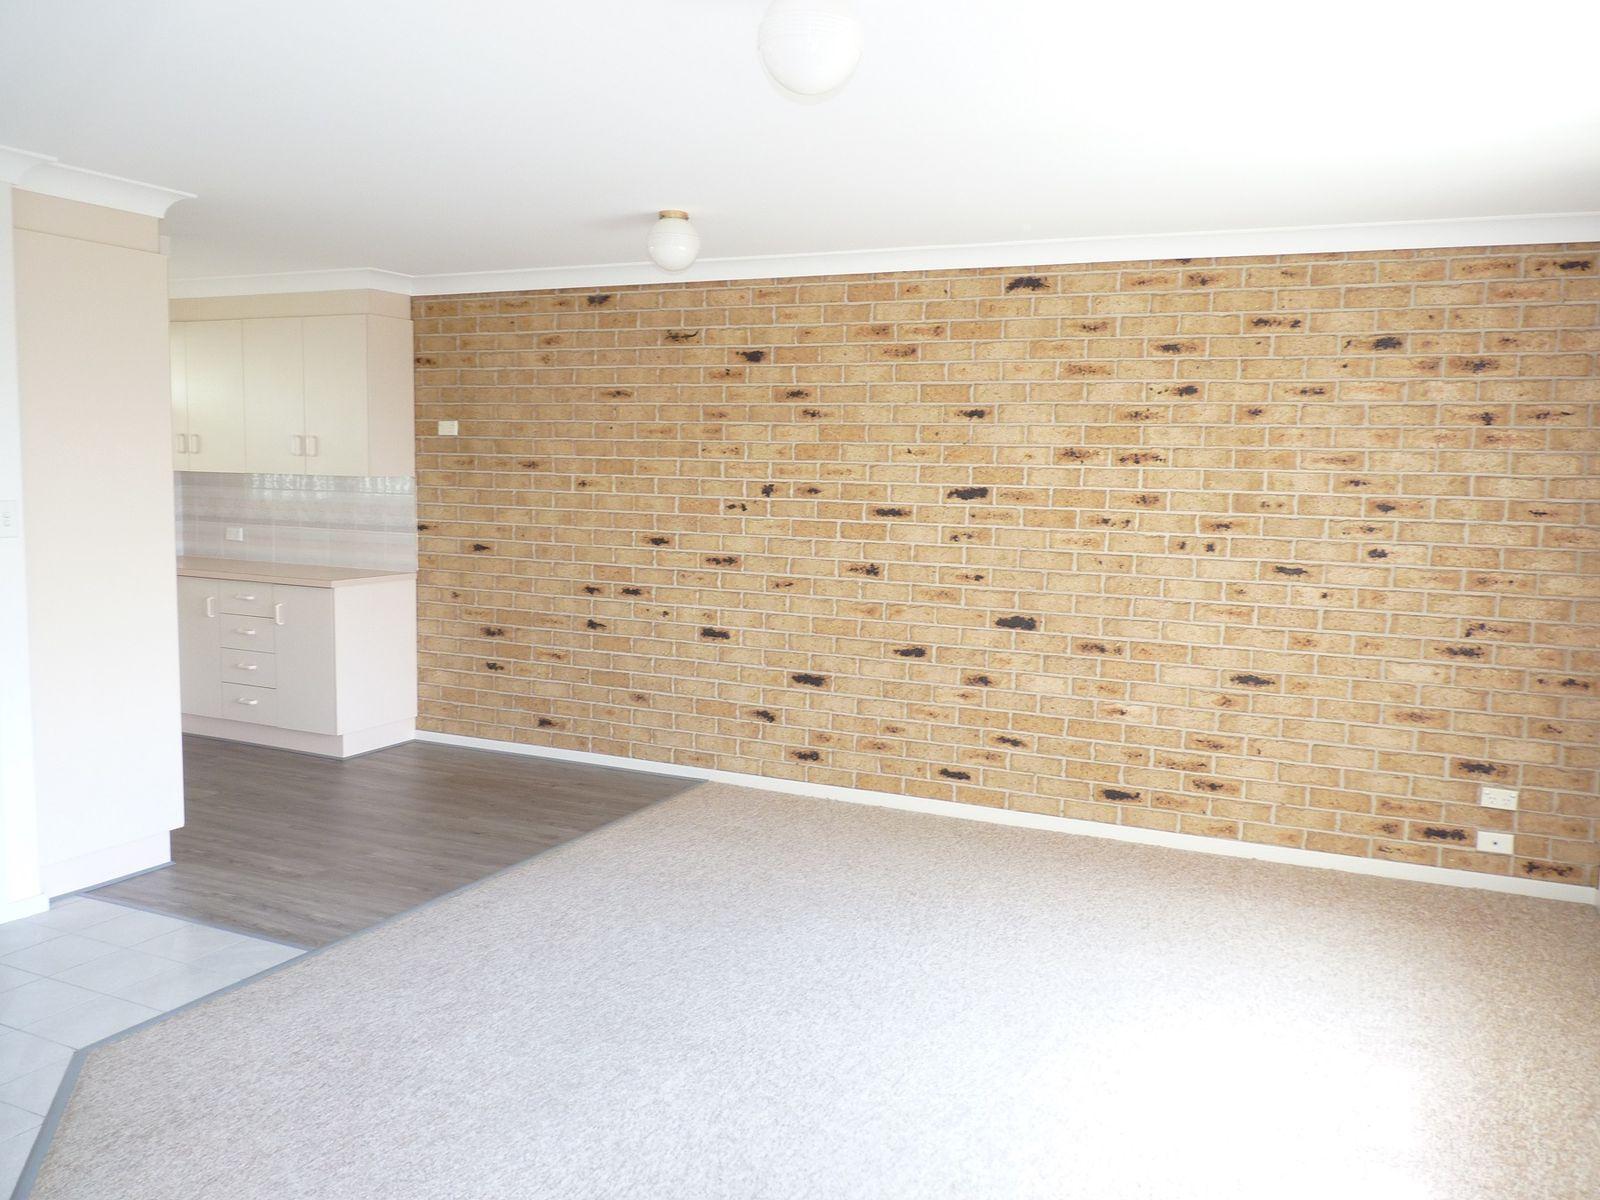 2/5 Jansan Close, Lismore Heights, NSW 2480